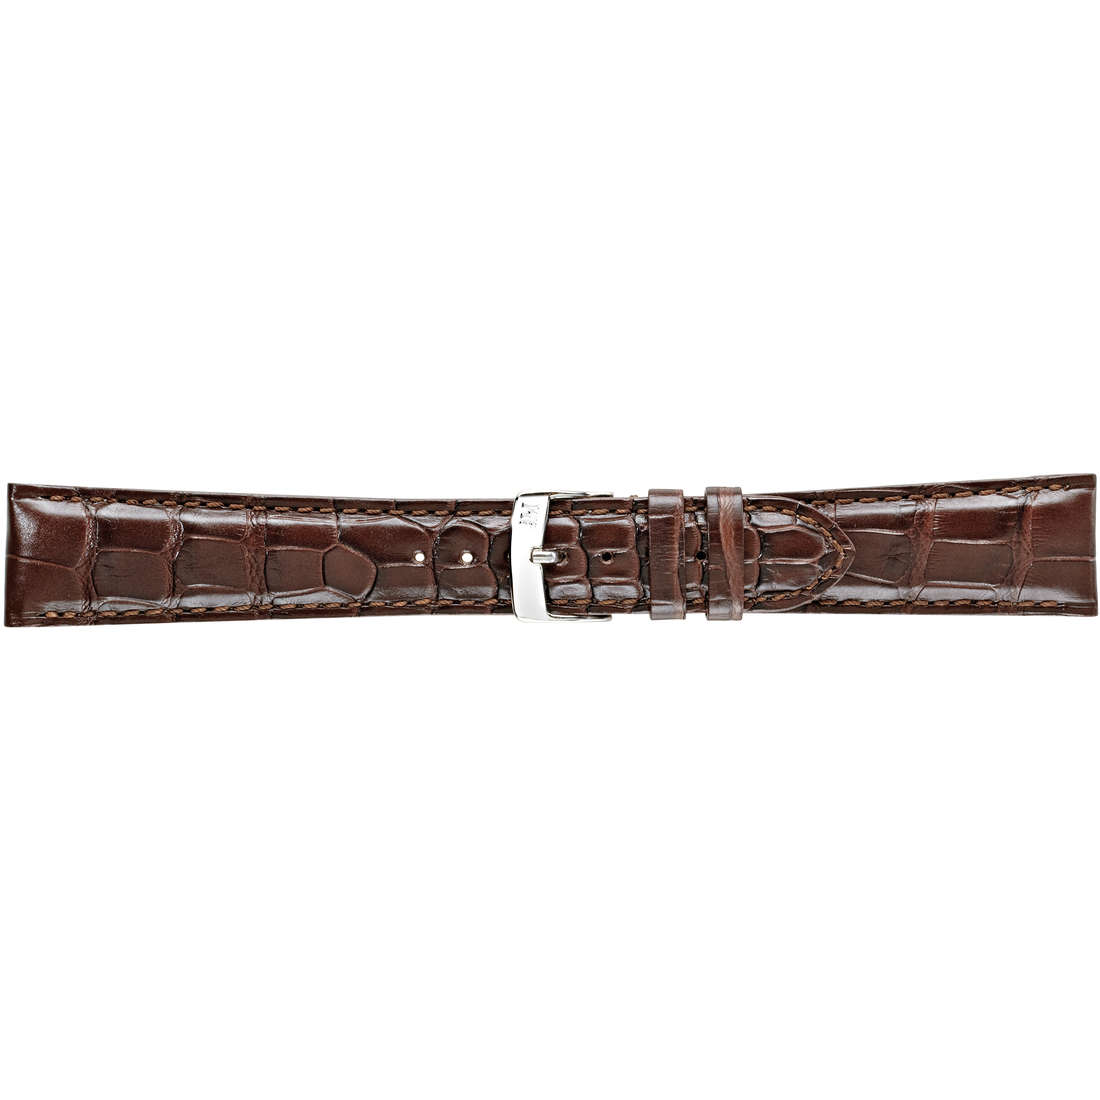 watch watch bands watch straps man Morellato Pelli Preziose A01U0518339034CR22